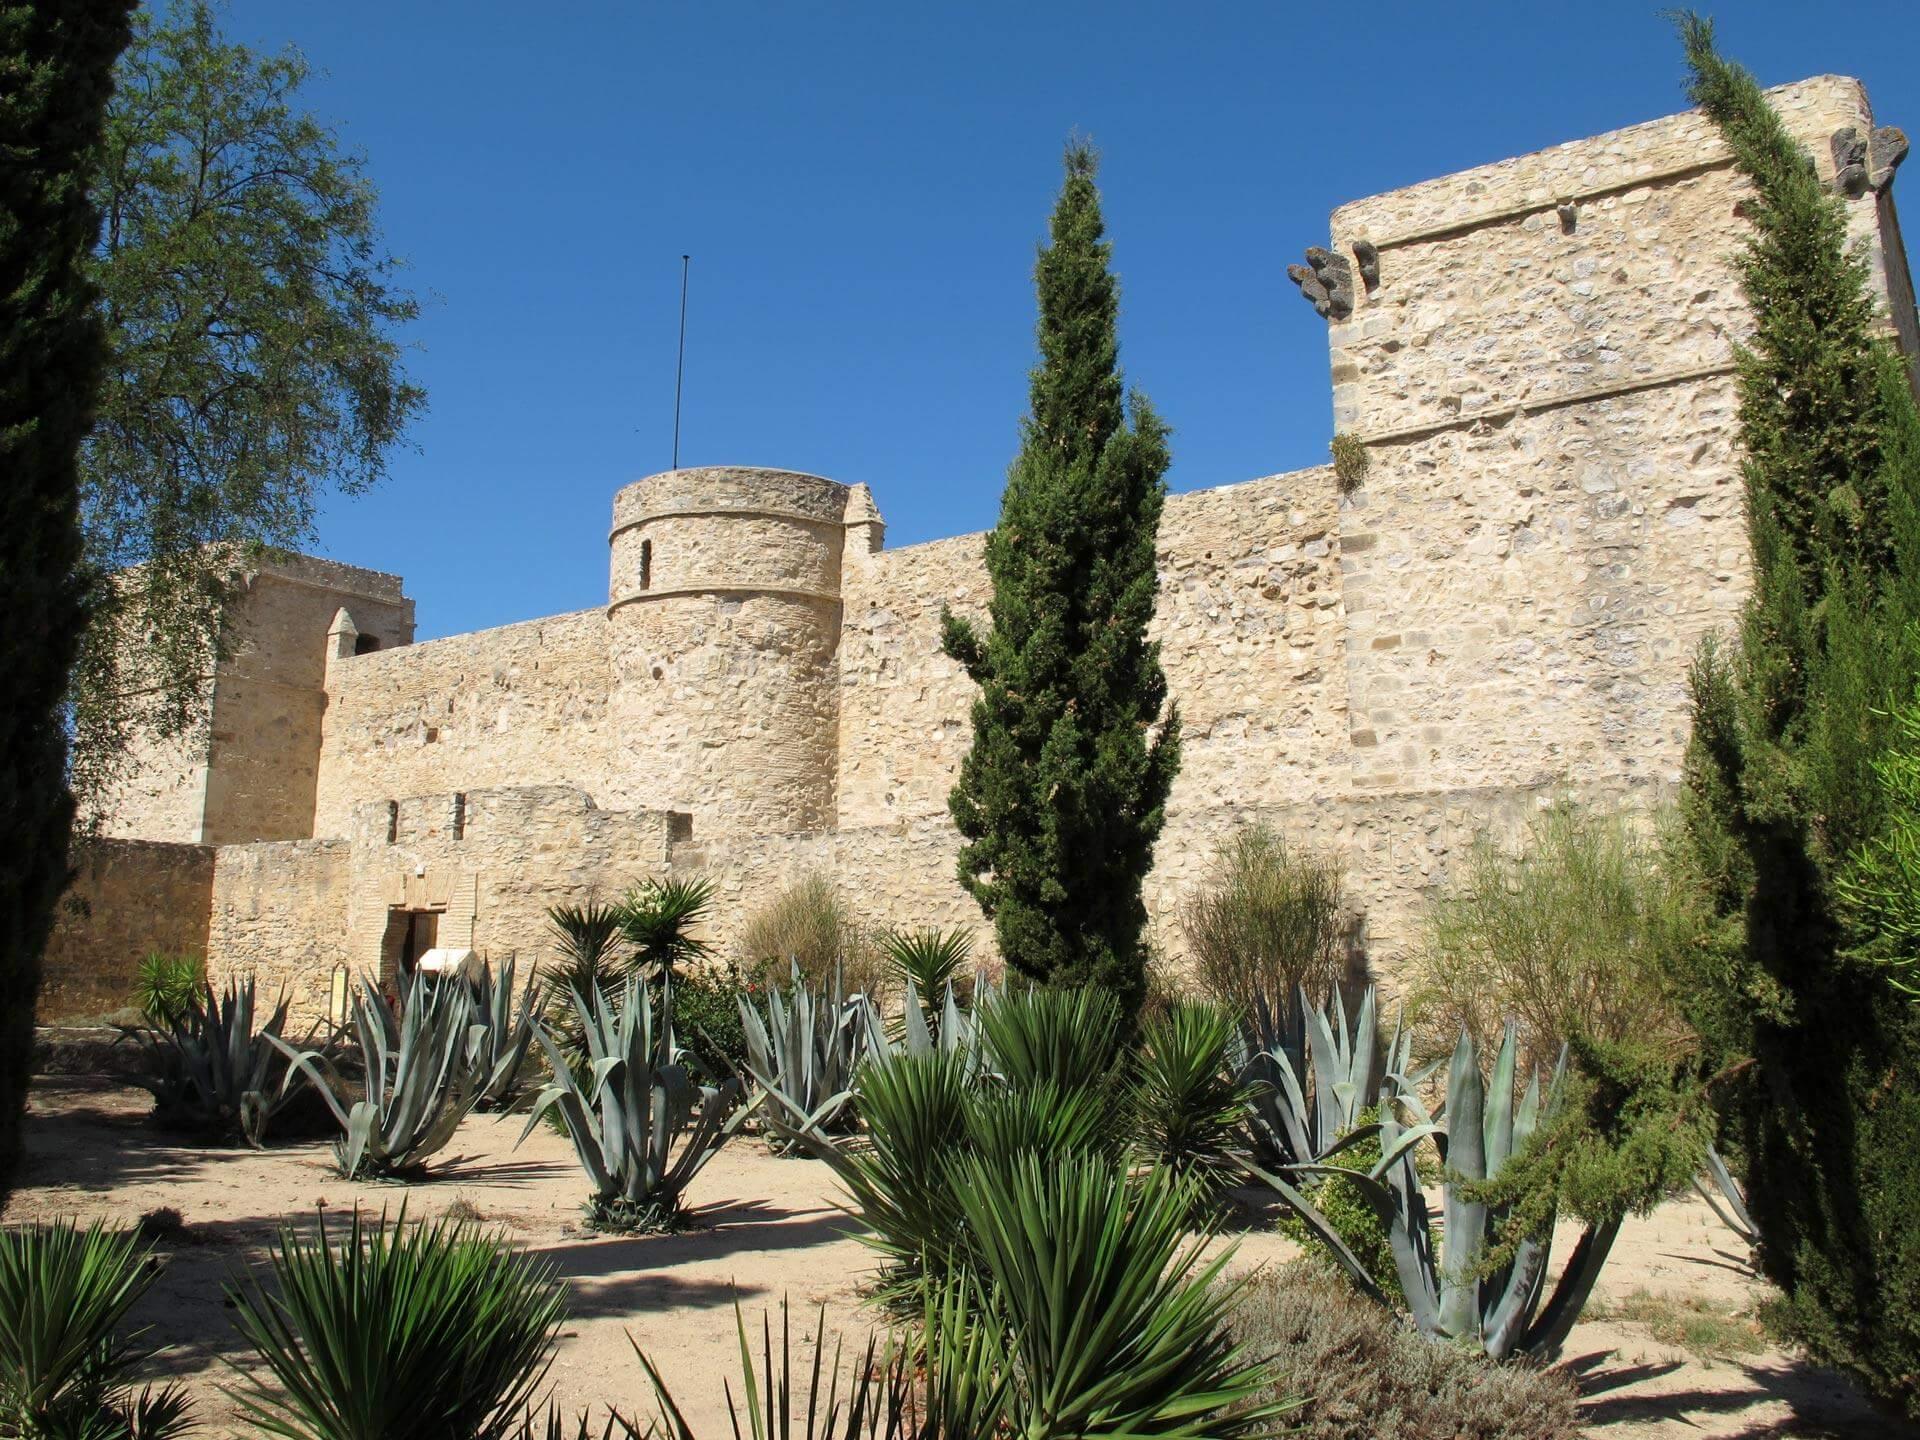 Castillo de Santiago Sanlúcar de Barrameda